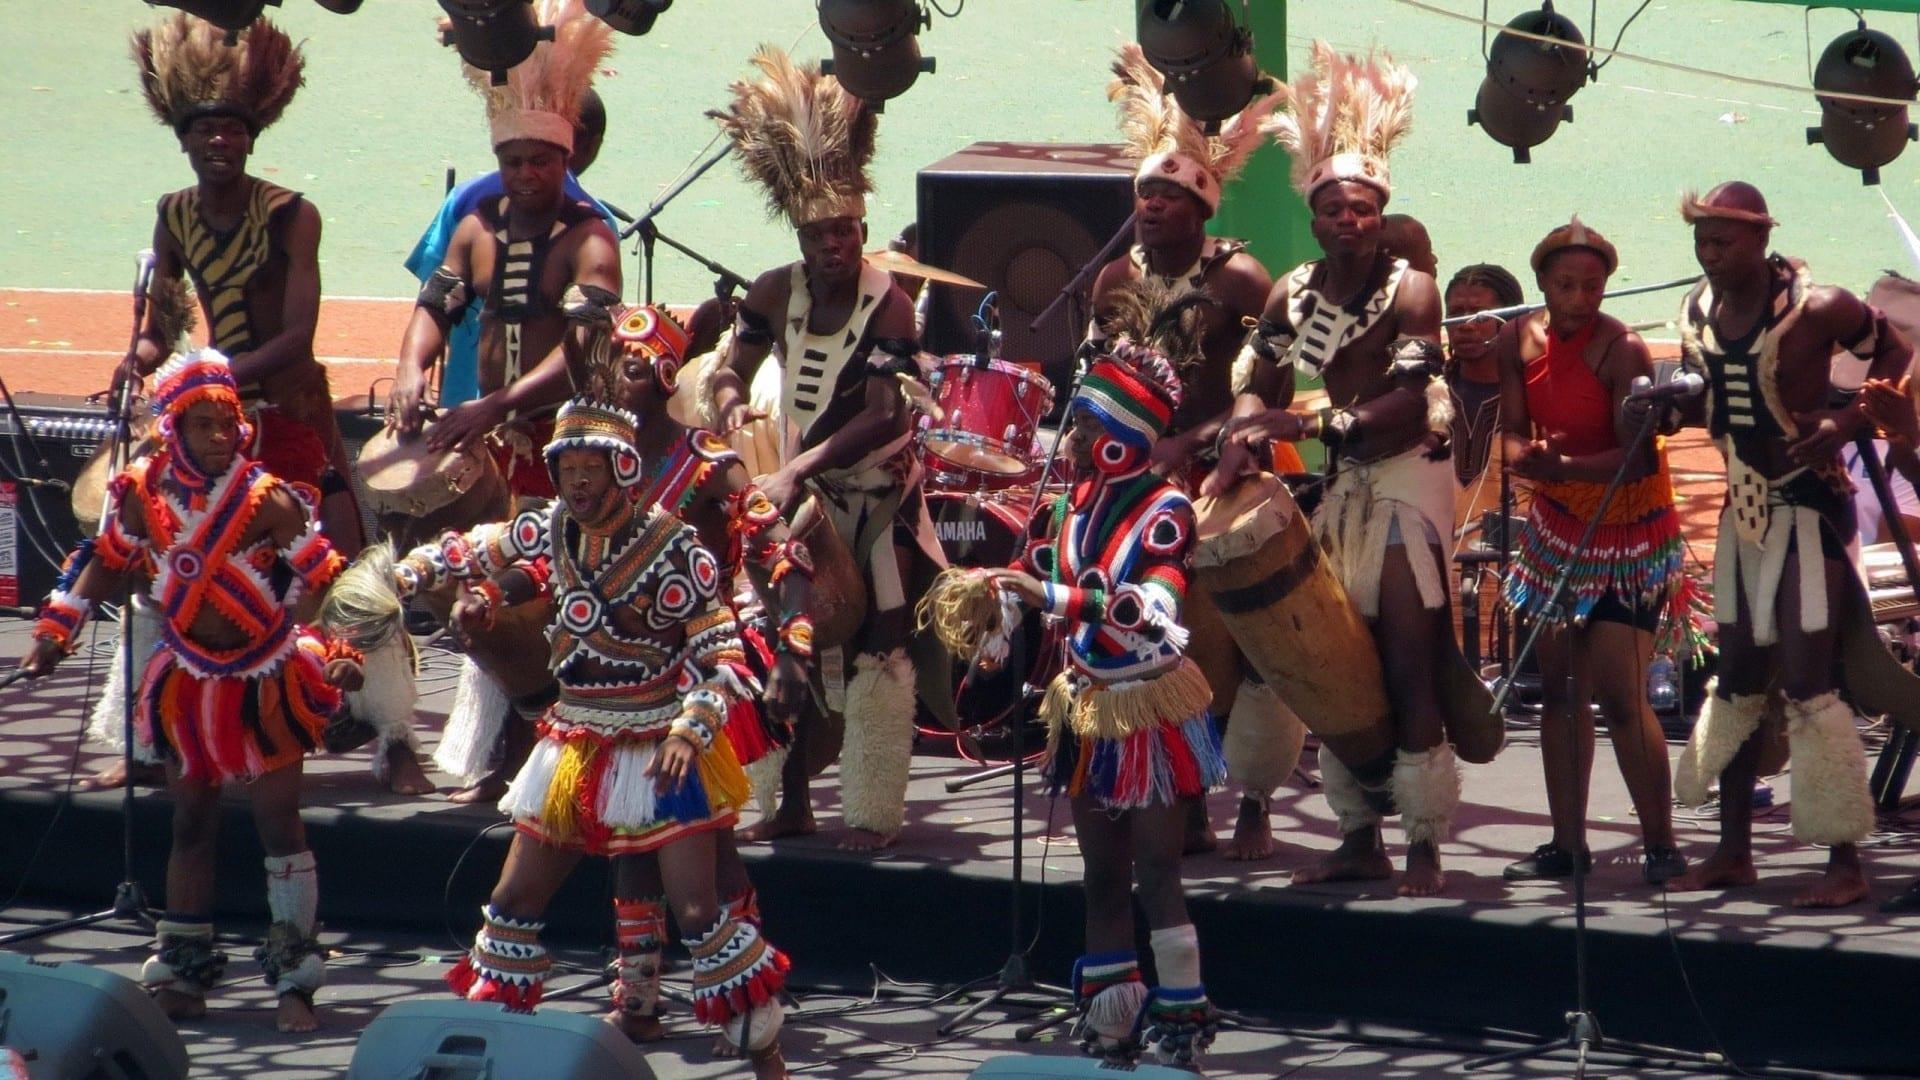 Danza tribal zambiana durante un evento en Lusaka Zambia